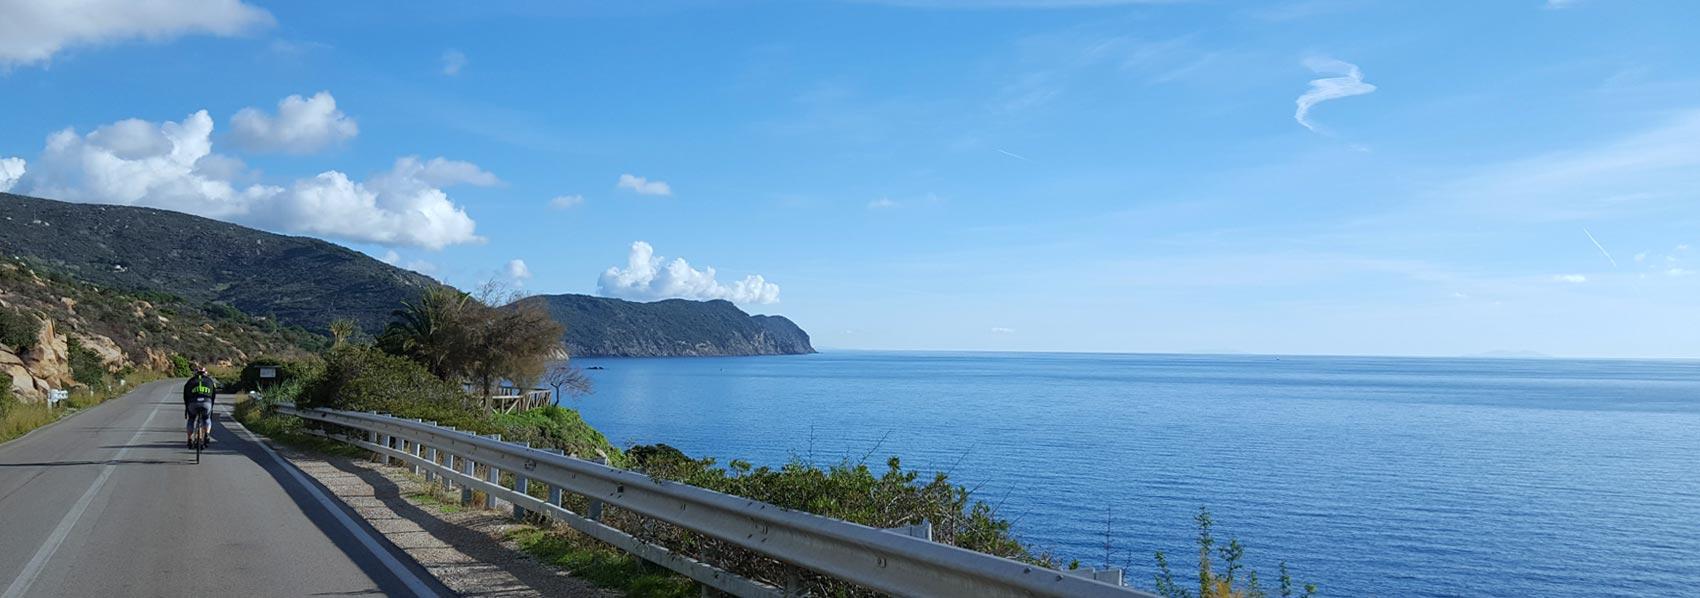 Isola d'Elba bici percorsi ciclismo